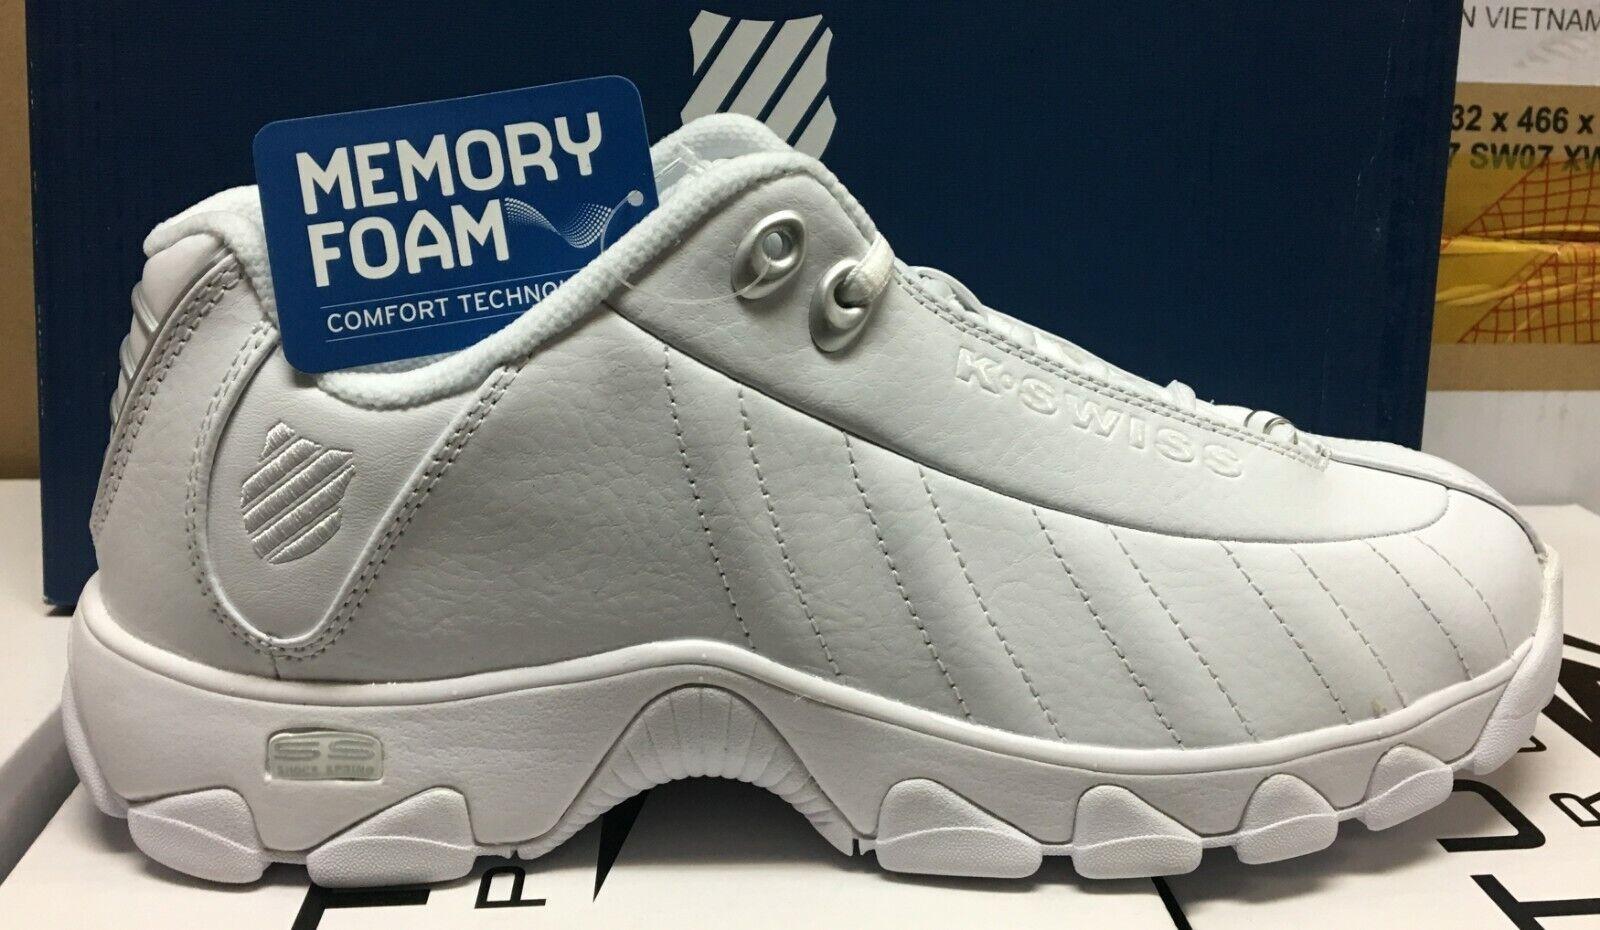 K-SWISS ST329 CMF Comfort Memory Foam Homme Casual Baskets Blanc 03426-155-M L